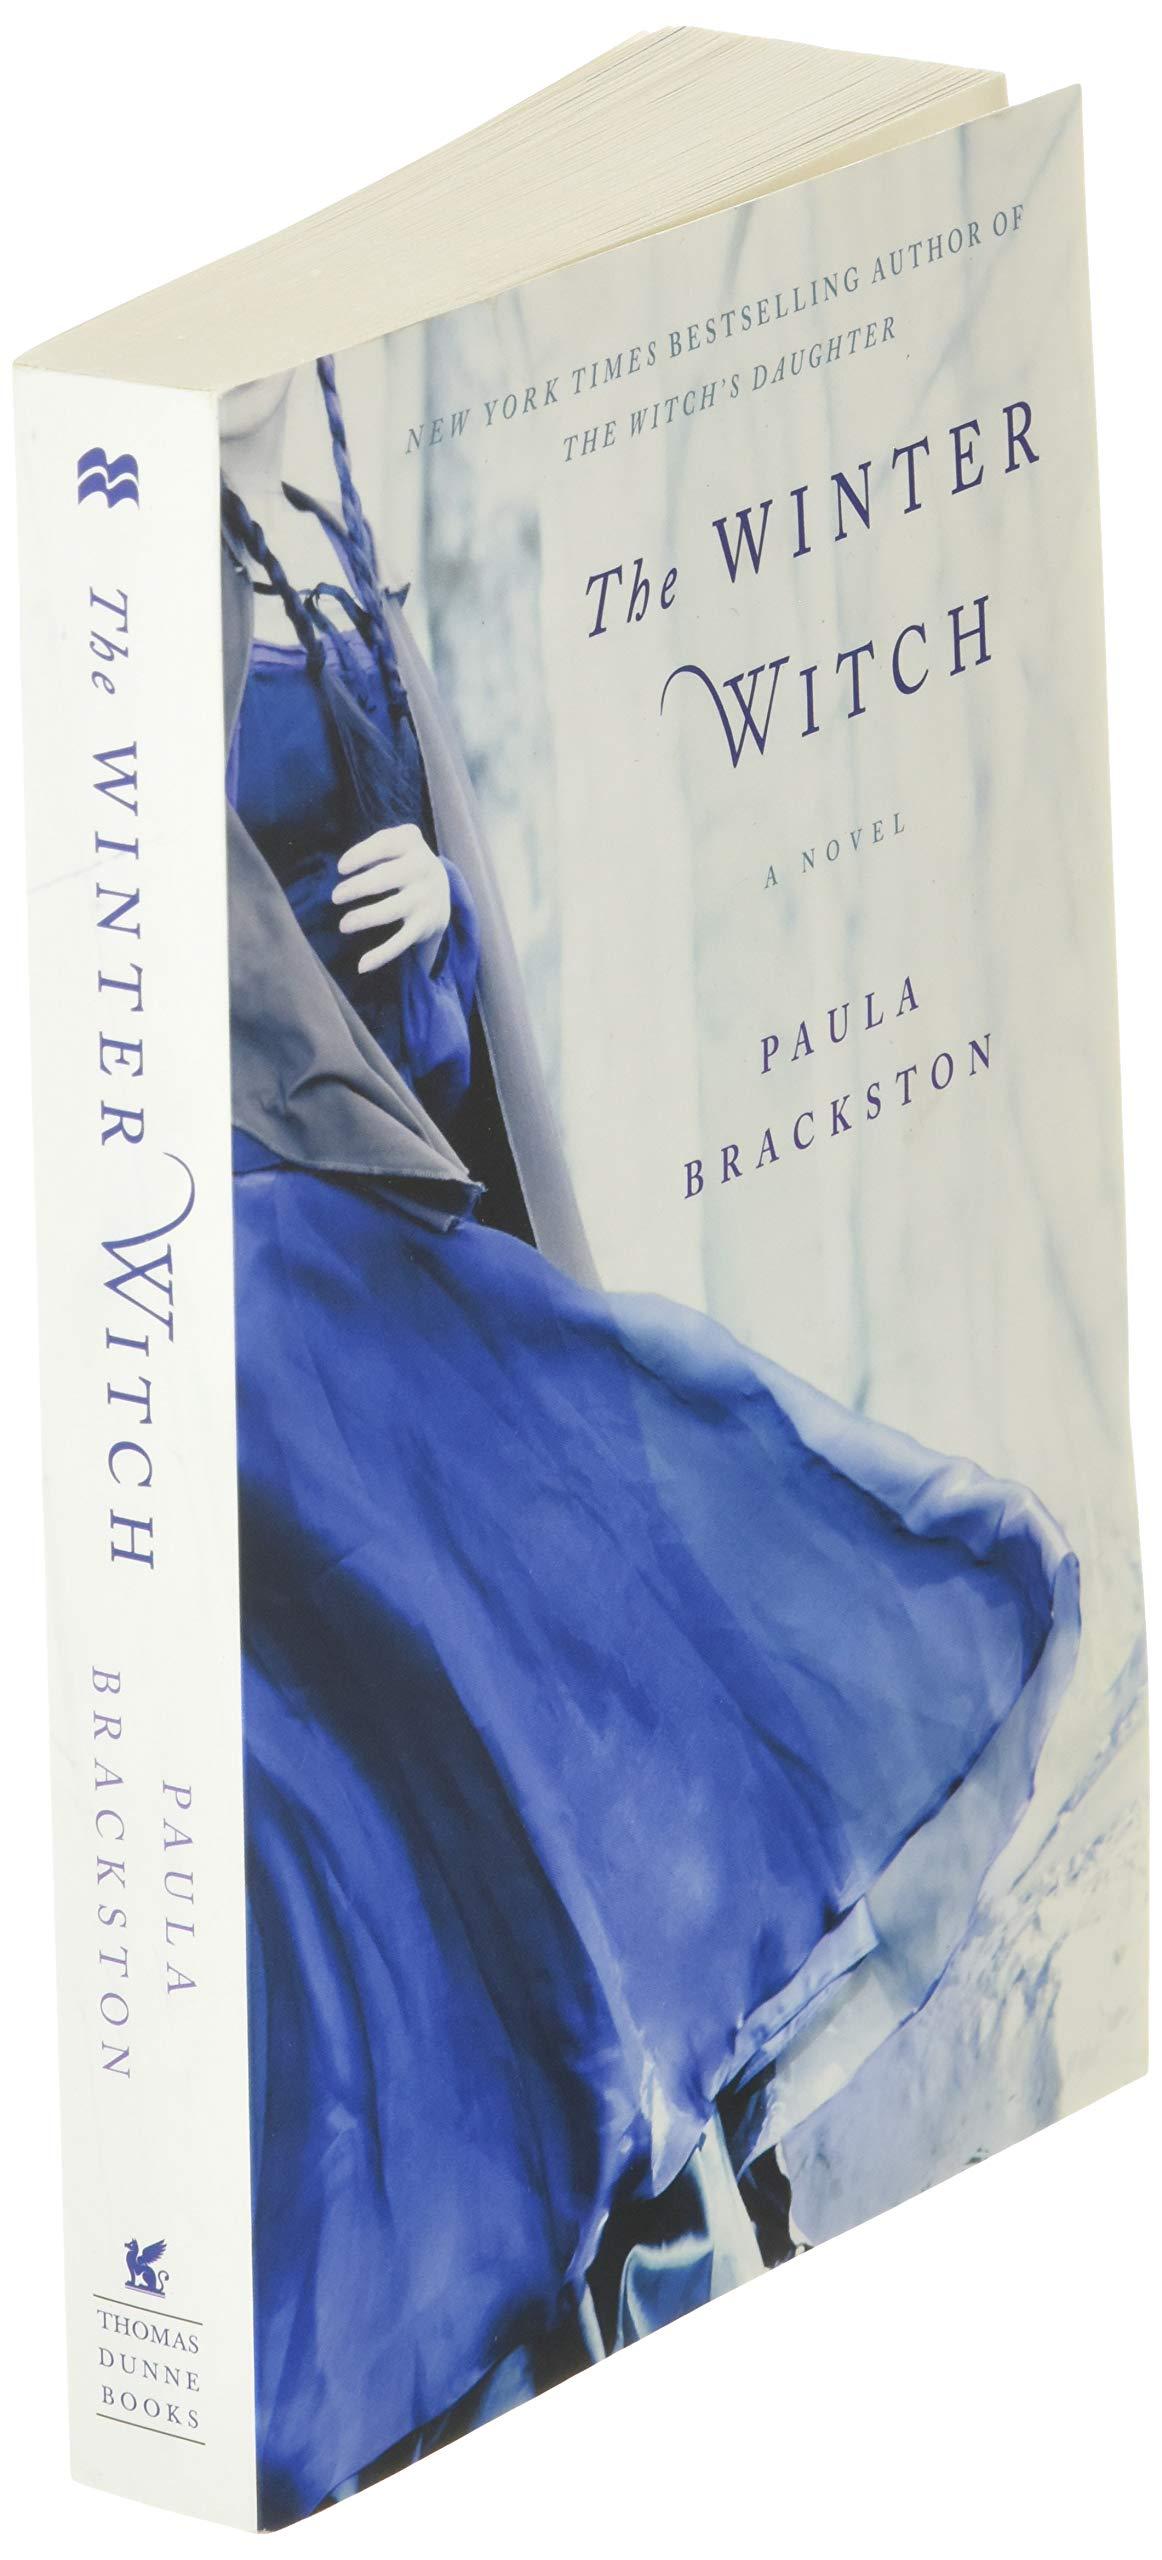 The Winter Witch A Novel Brackston, Paula 20 Amazon ...